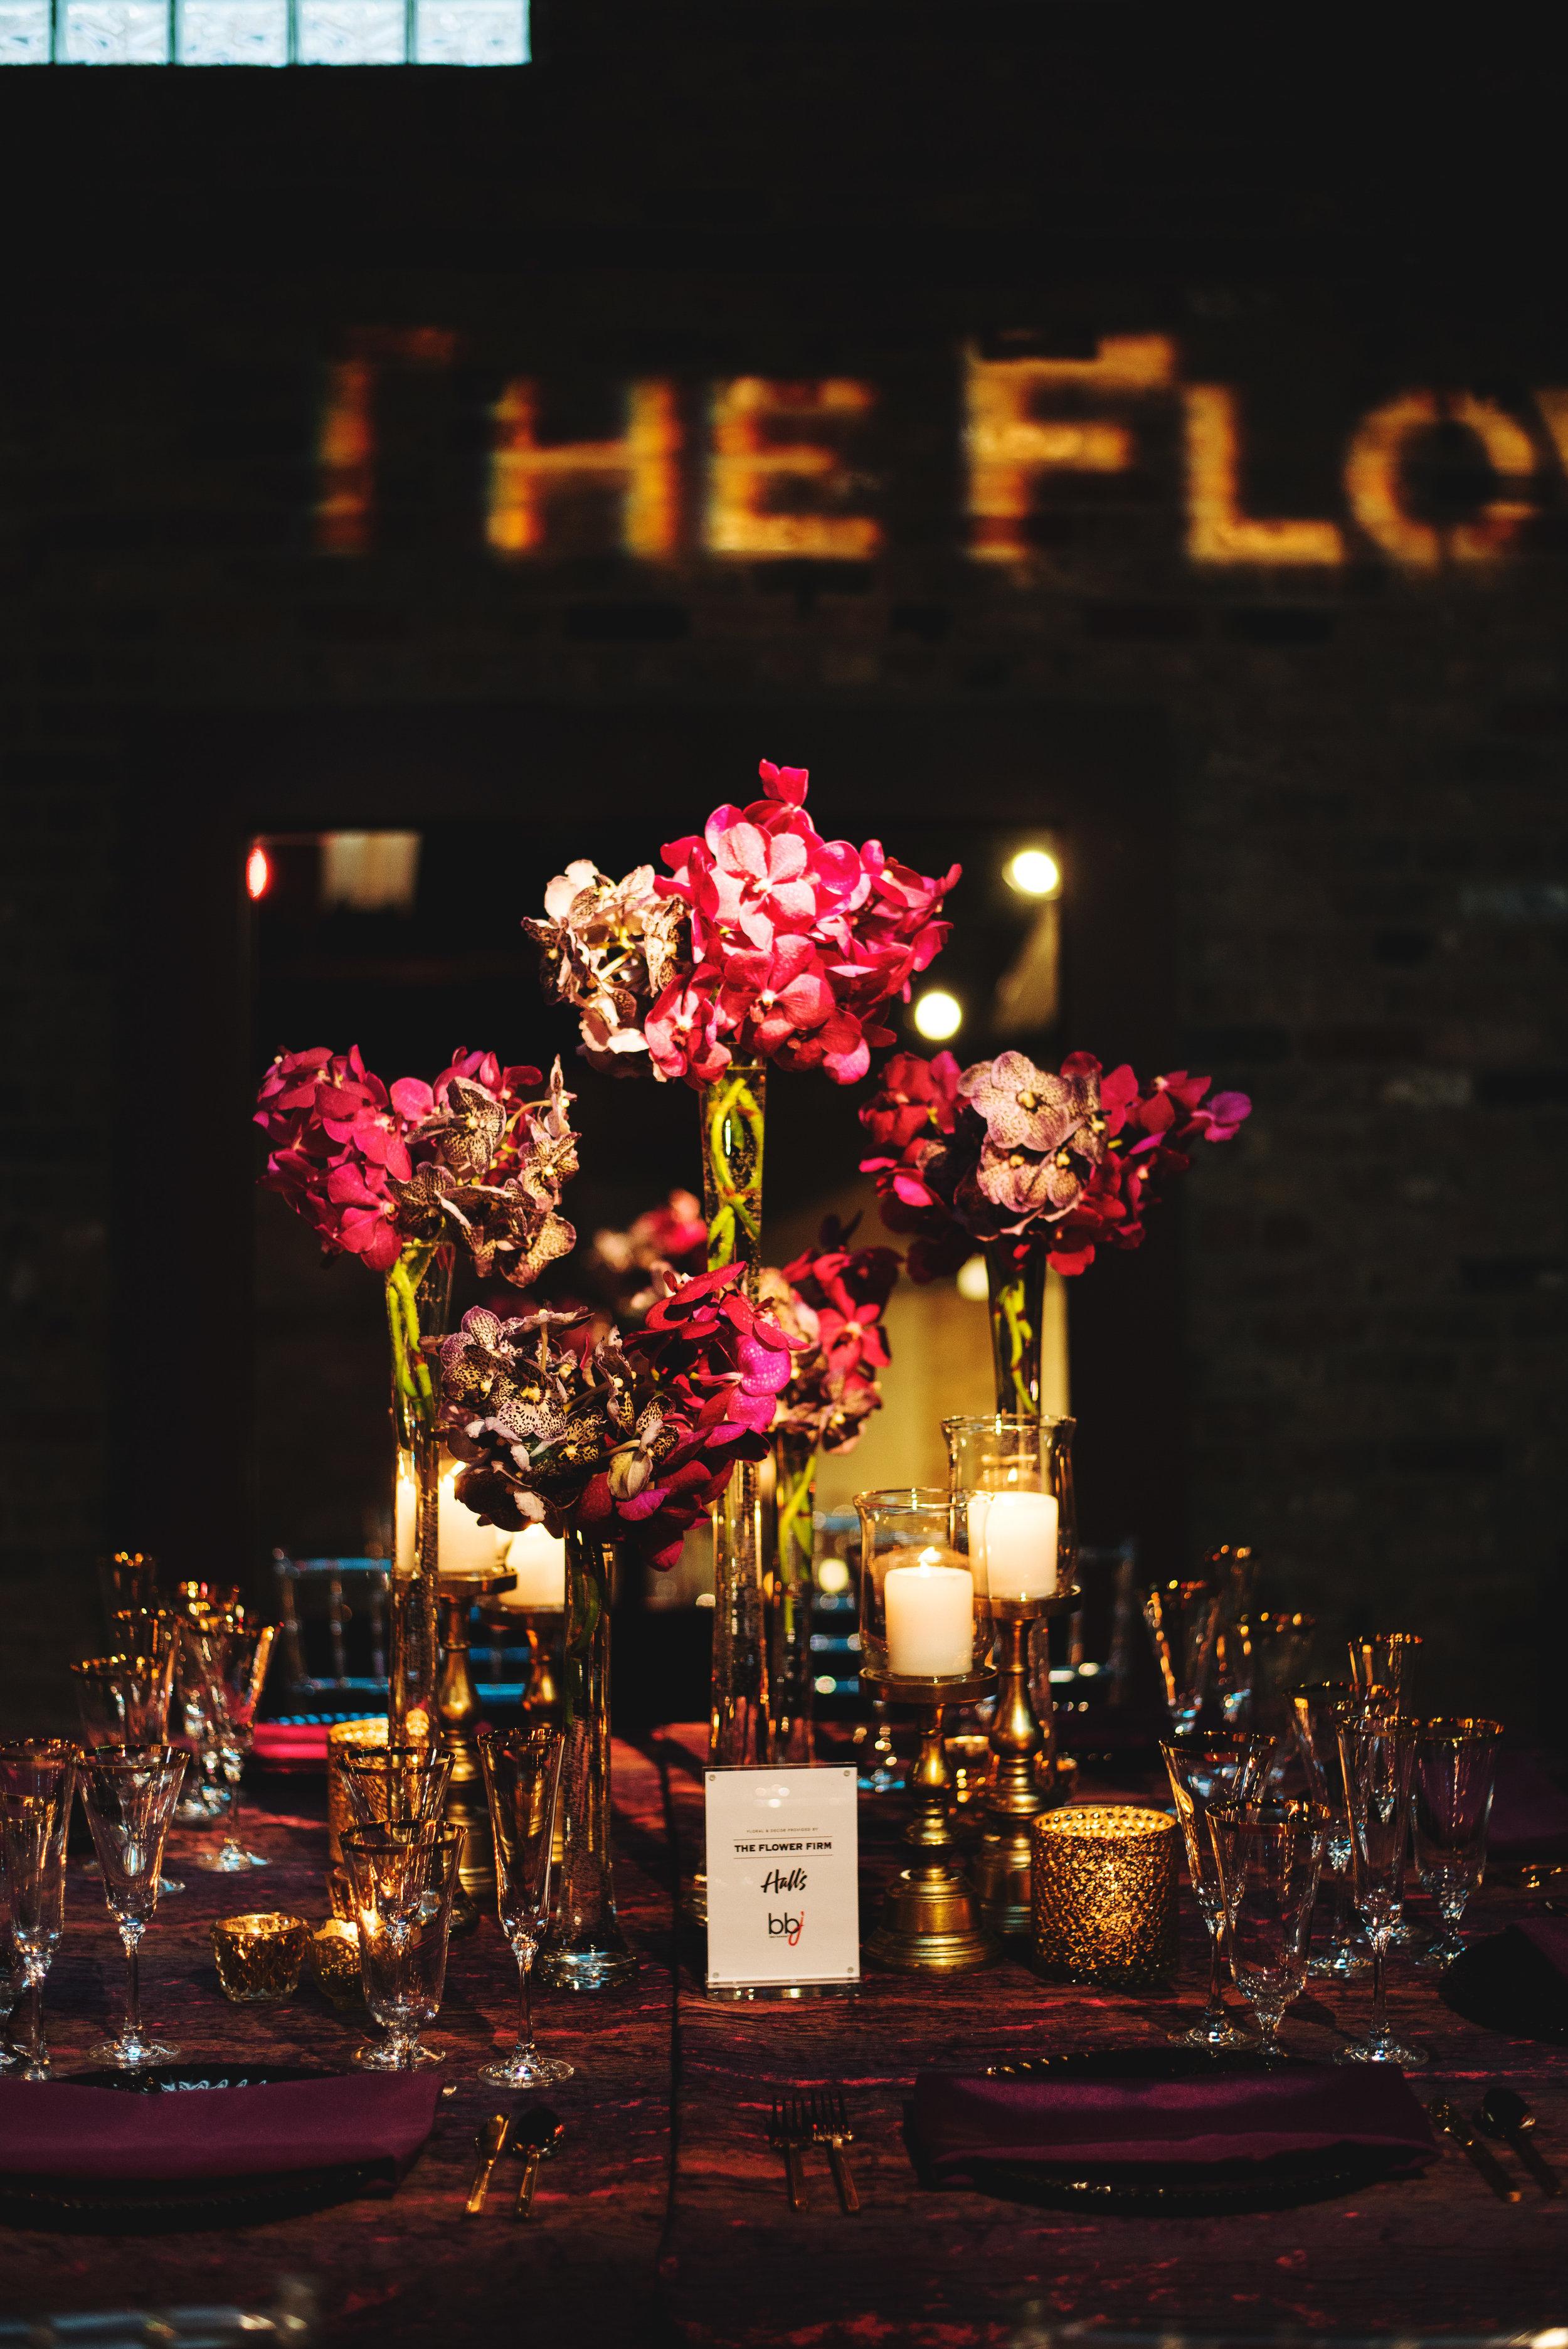 TheFlowerFirm-Event-Chicago00020.jpg